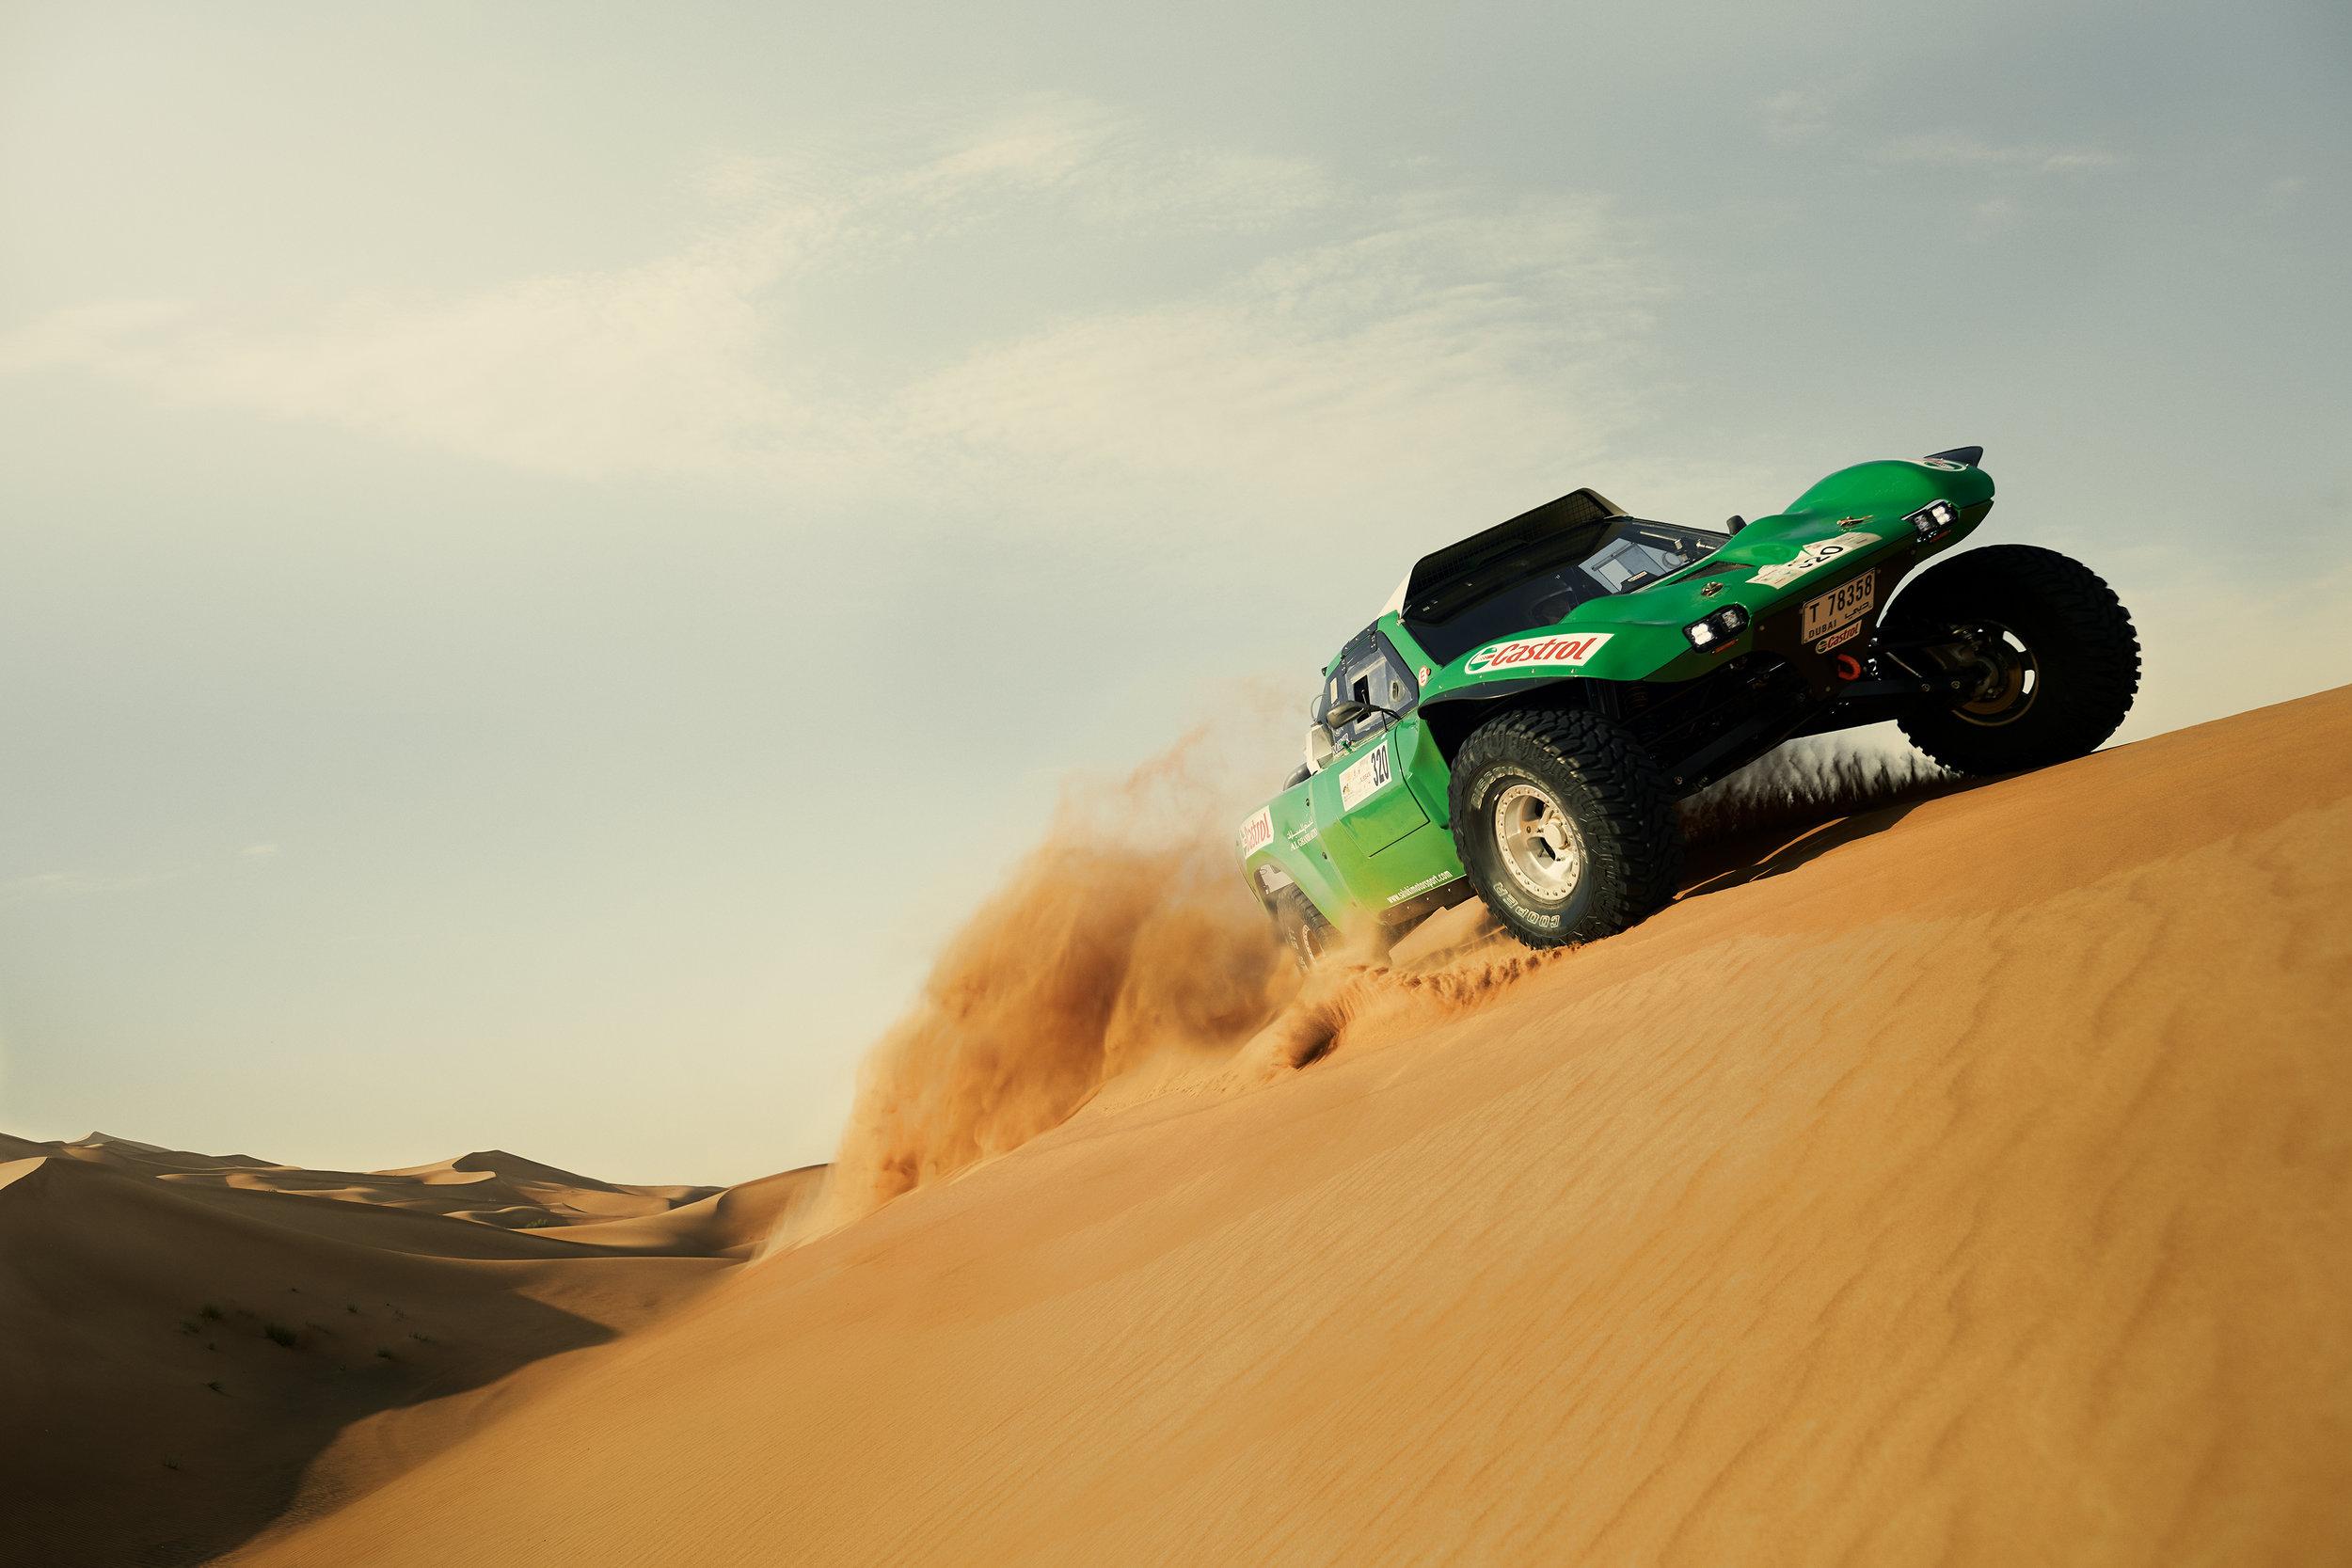 DesertCar_4_B_VersionB.jpg